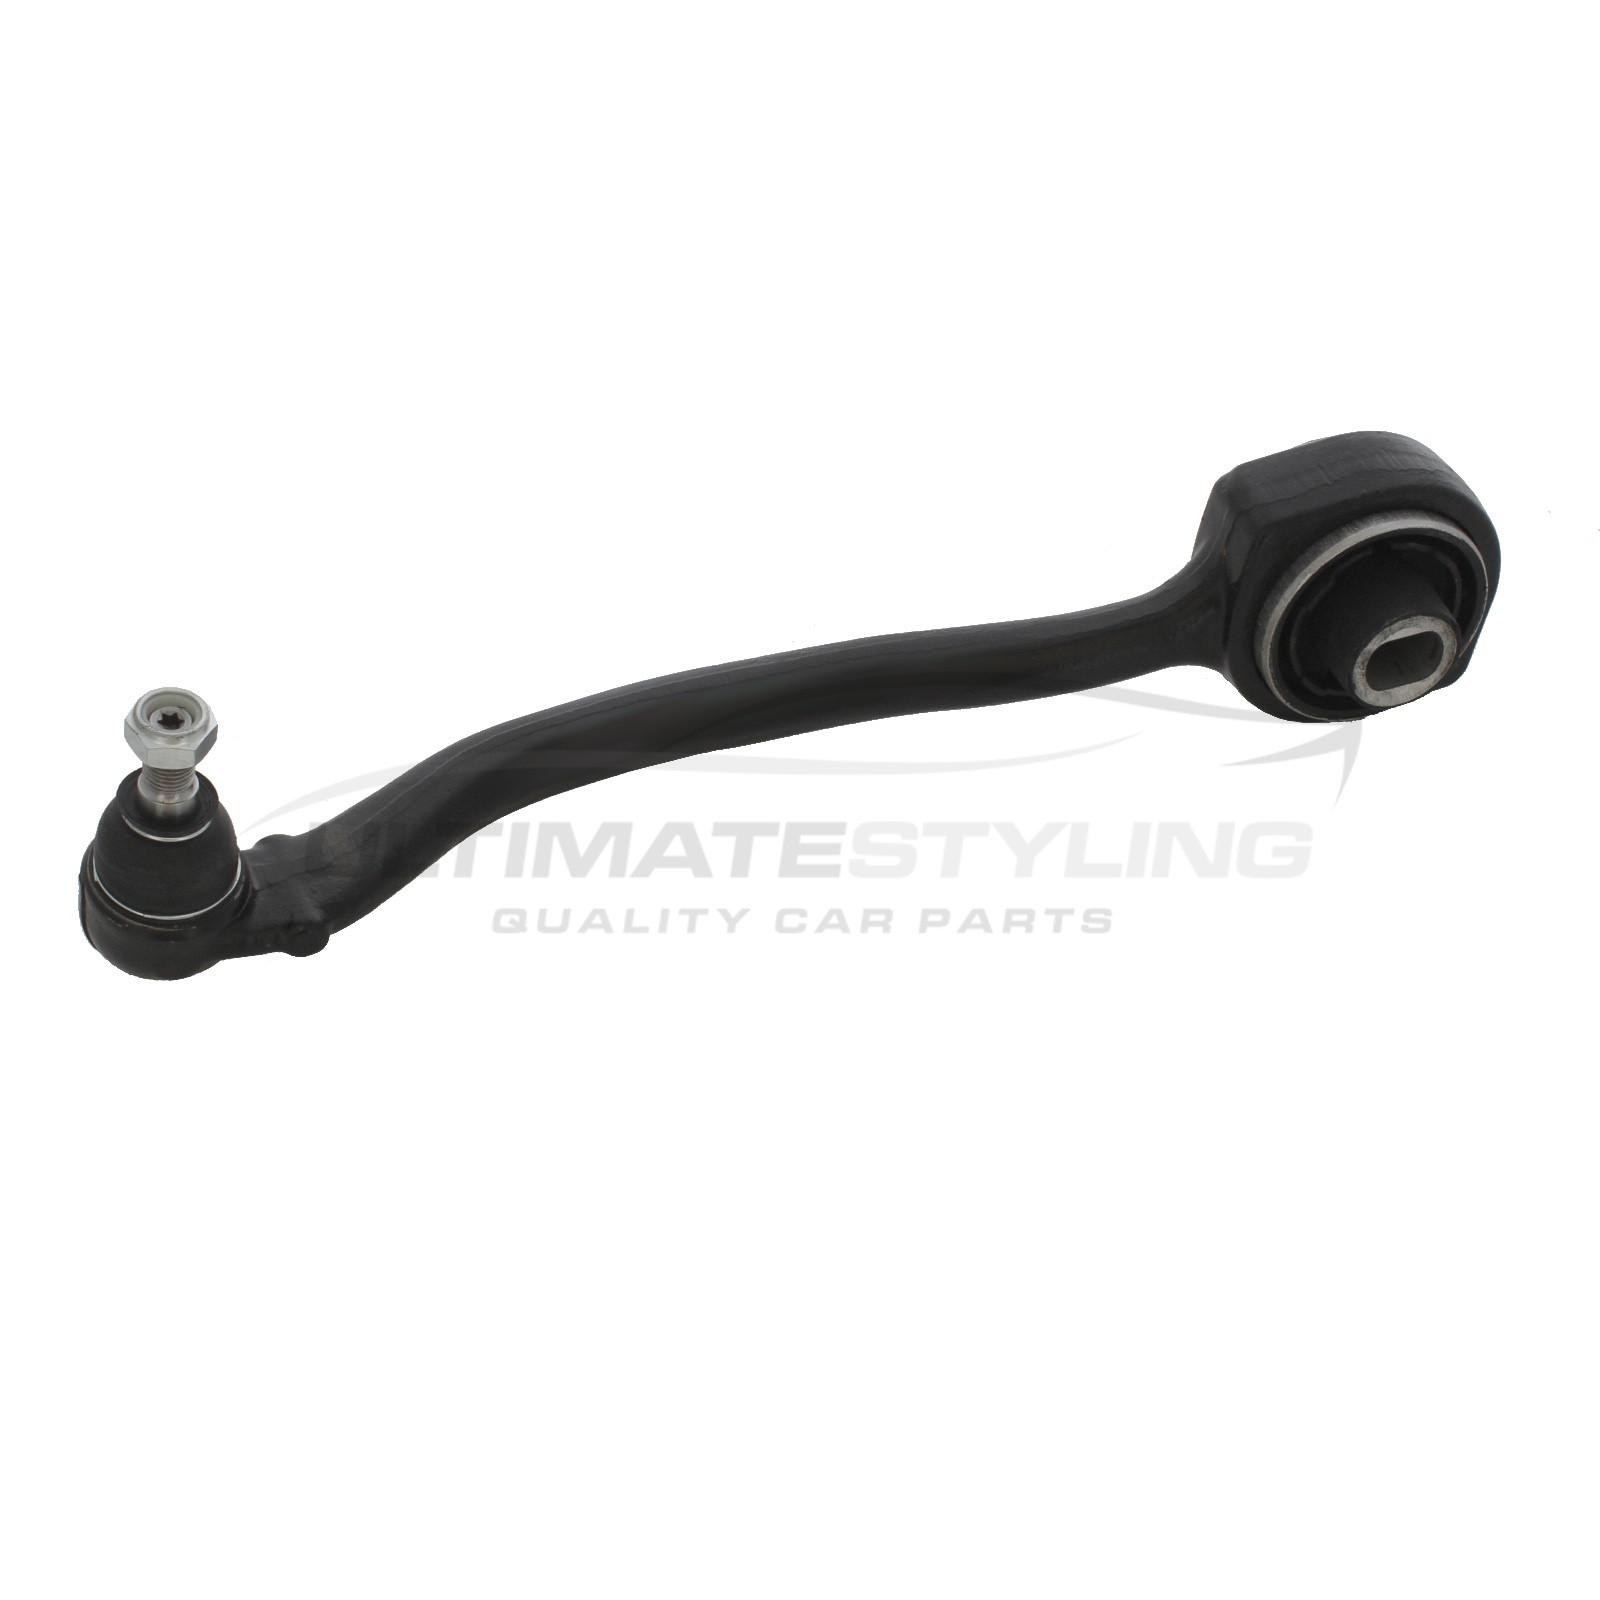 Mercedesbenz C Class Control Arm Assembly 2033303311